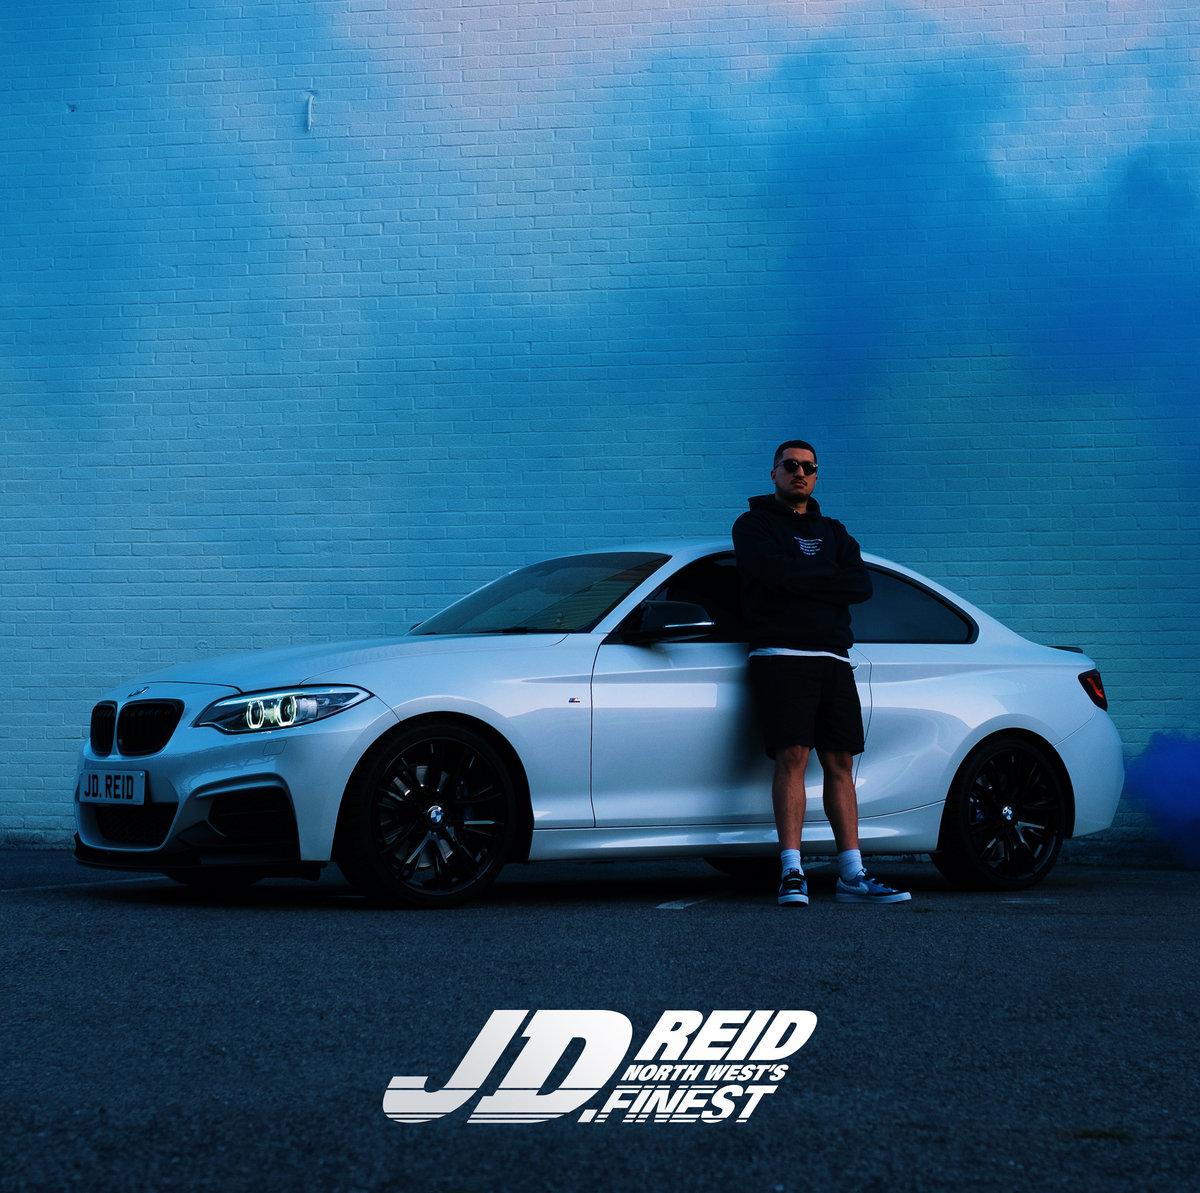 North West's Finest mixtape - JD Reid